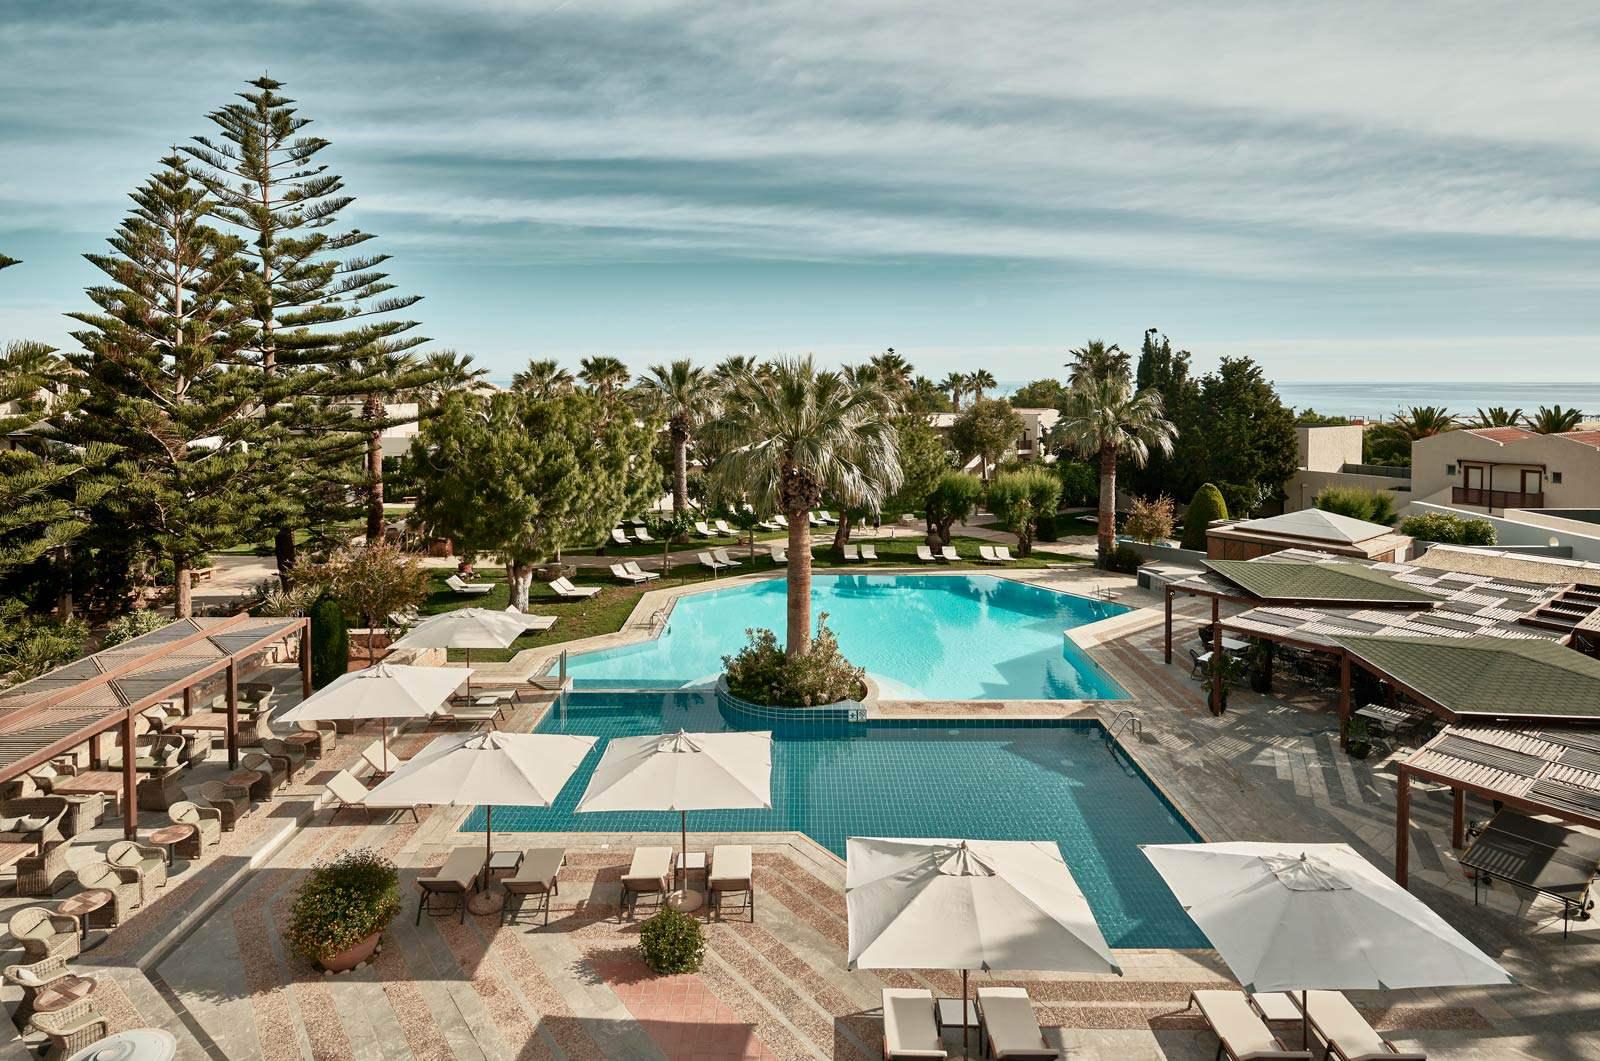 Cretan Malia Park Swimming Pool